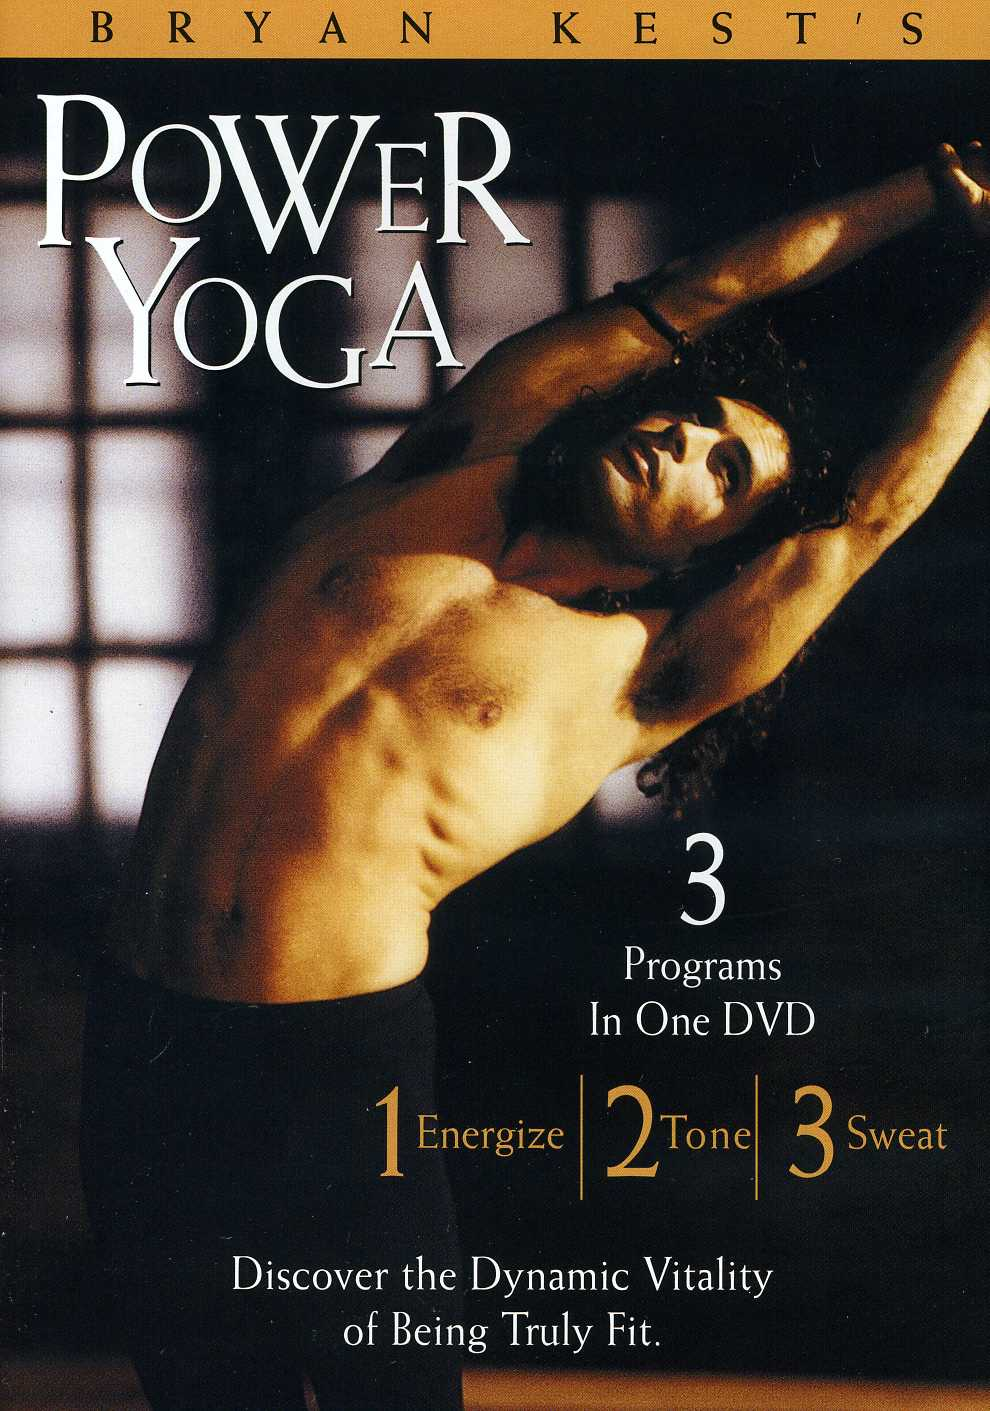 Bryan Kest's Power Yoga (DVD)